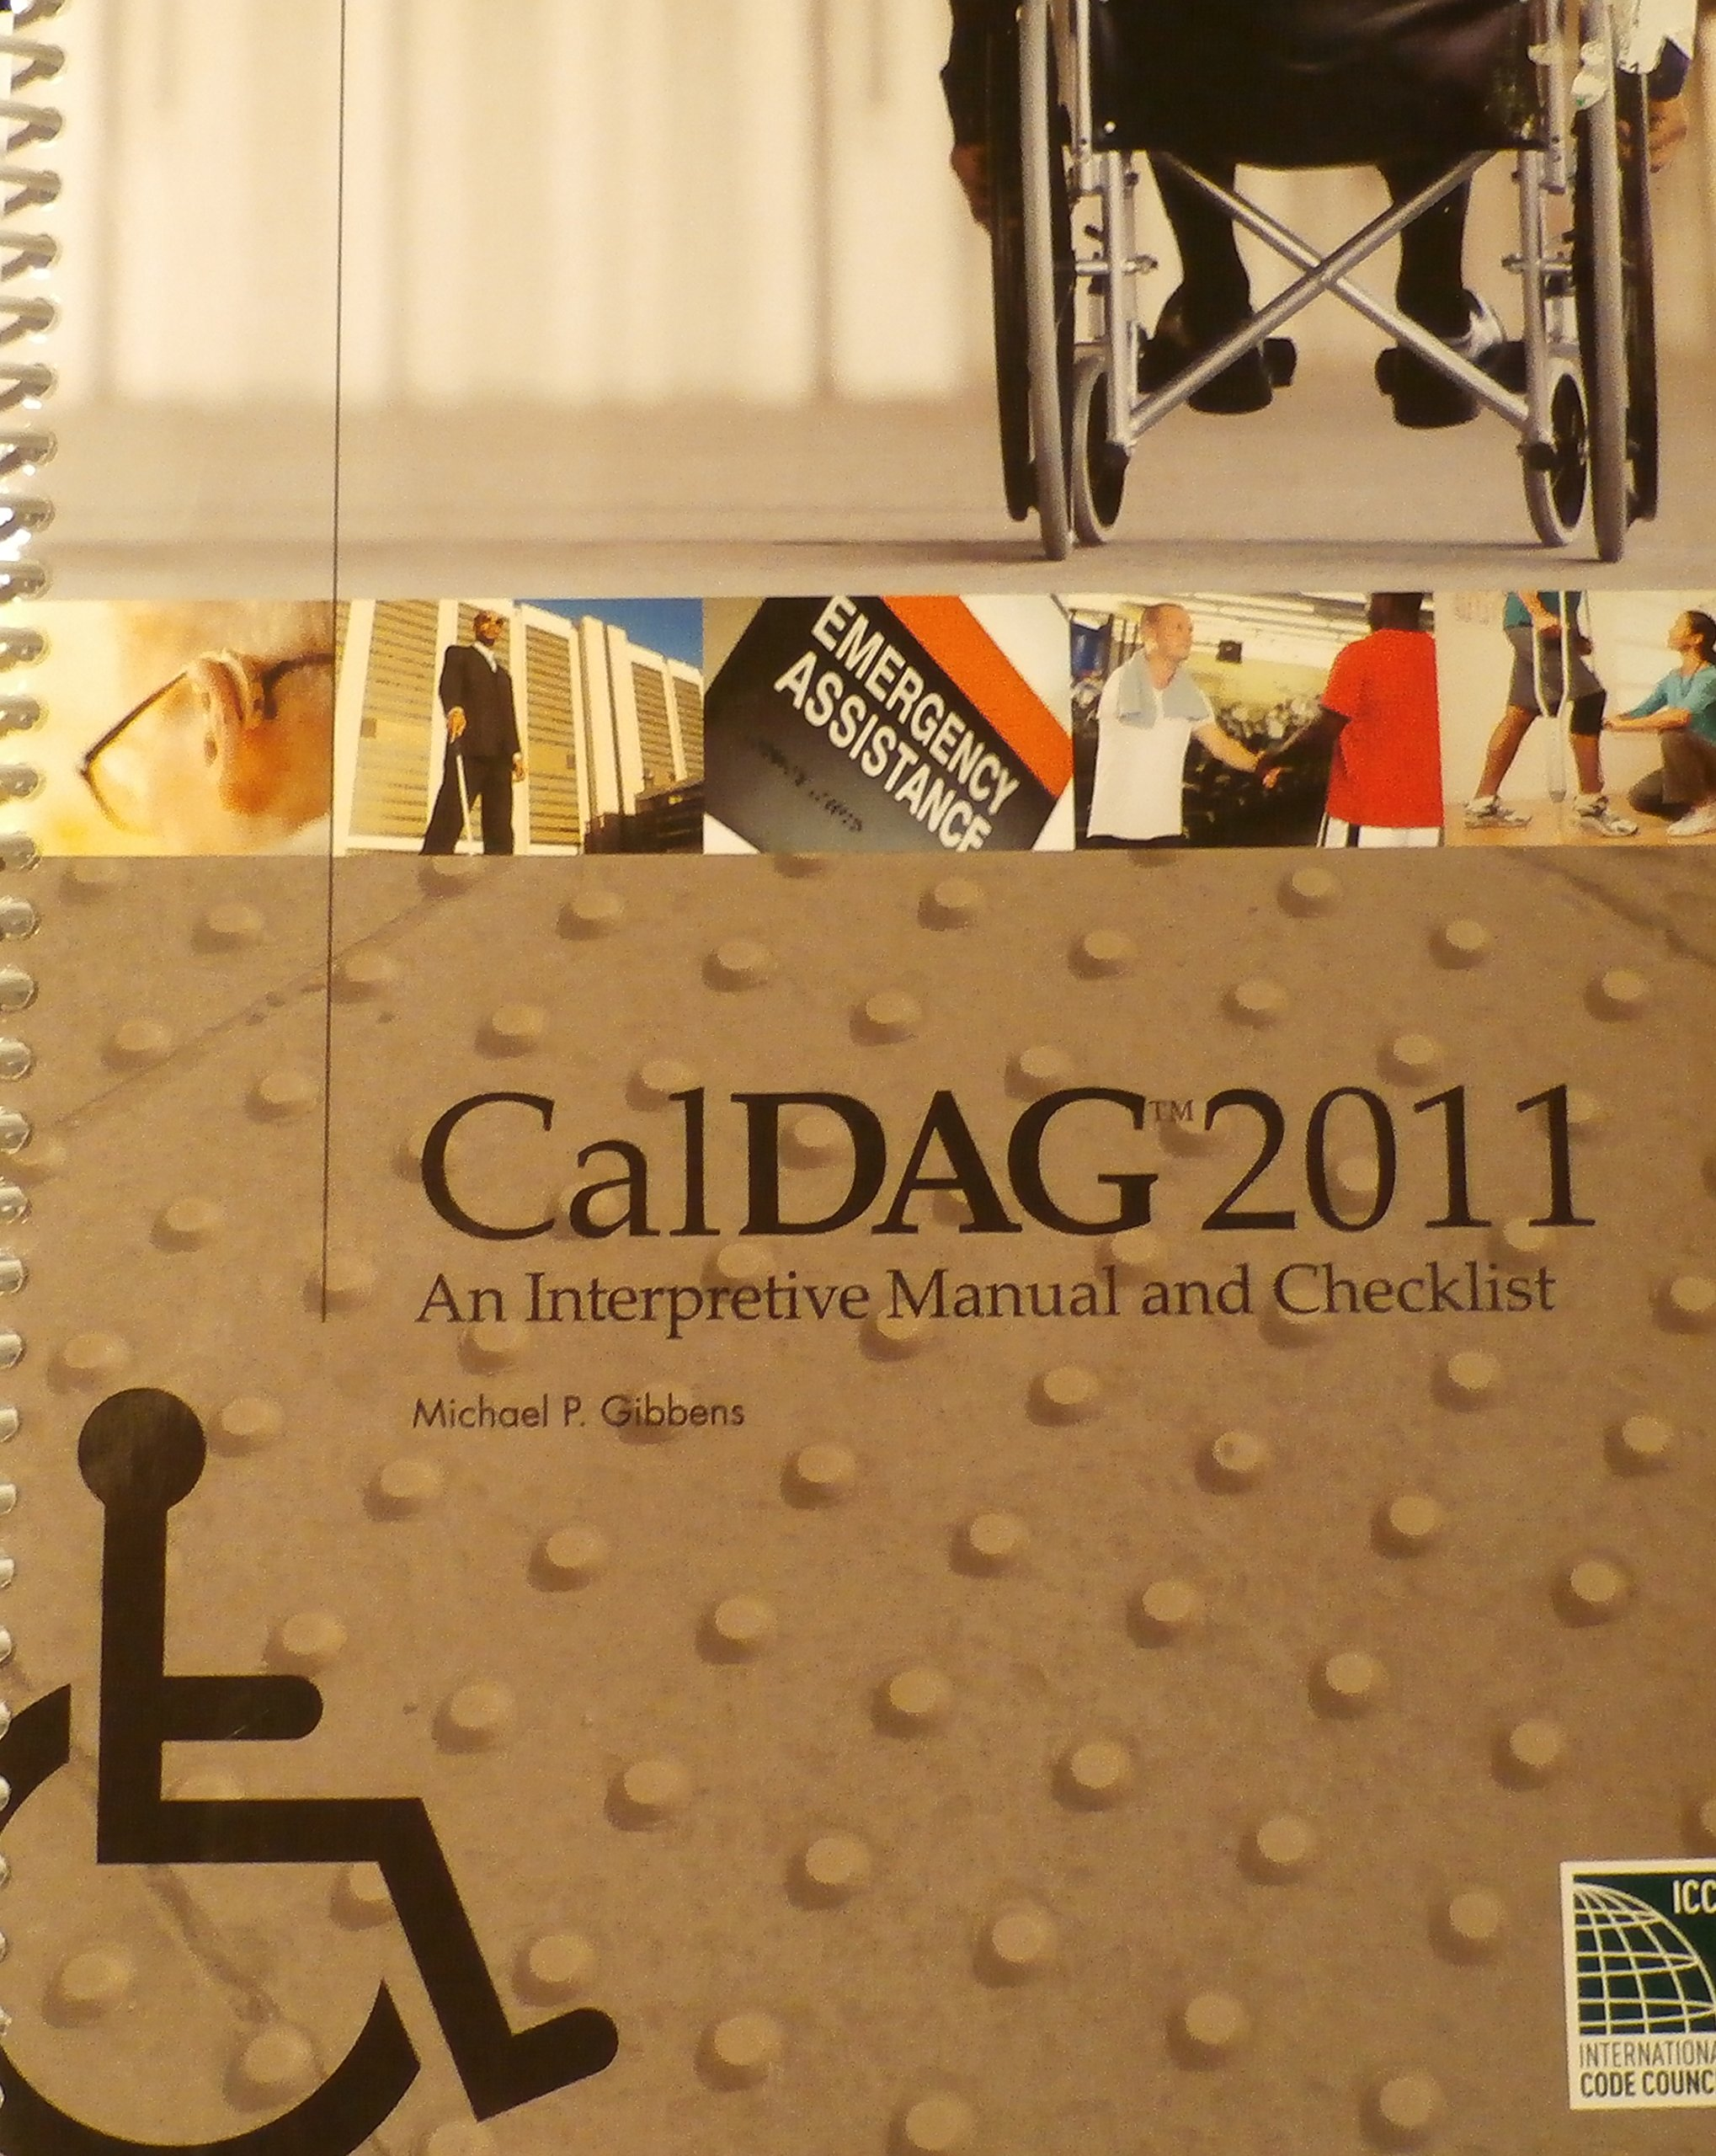 CalDAG: 2011 An Interpretive Manual and Checklist: Amazon.es: Michael  Gibbens: Libros